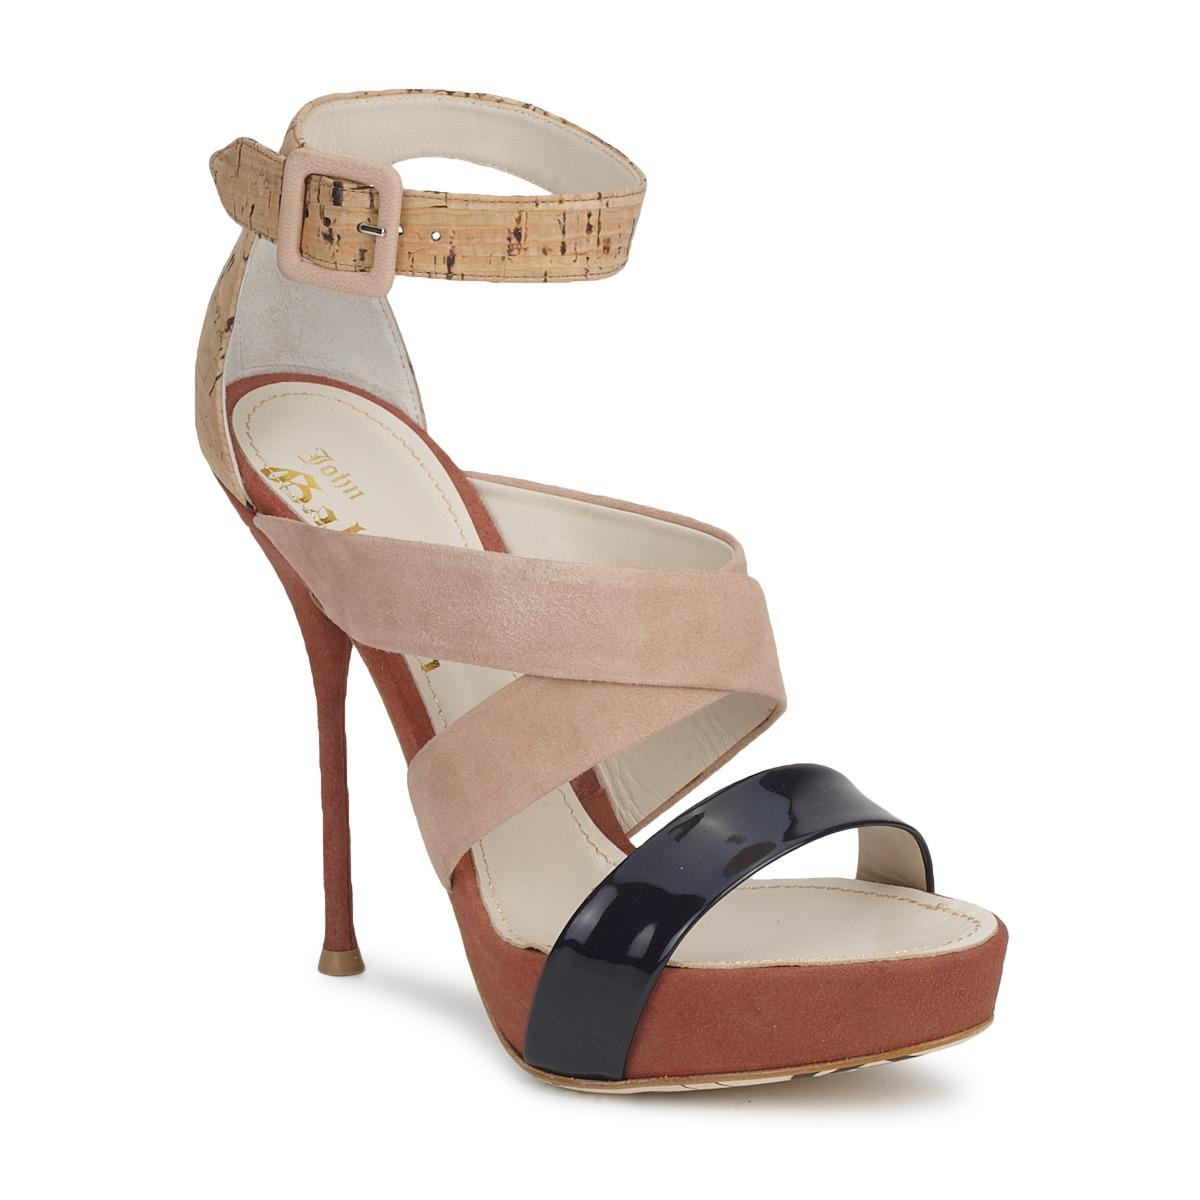 John Galliano AN6363 Rose / Marine / Beige - Kostenloser Versand bei Spartoode ! - Schuhe Sandalen / Sandaletten Damen 297,50 €